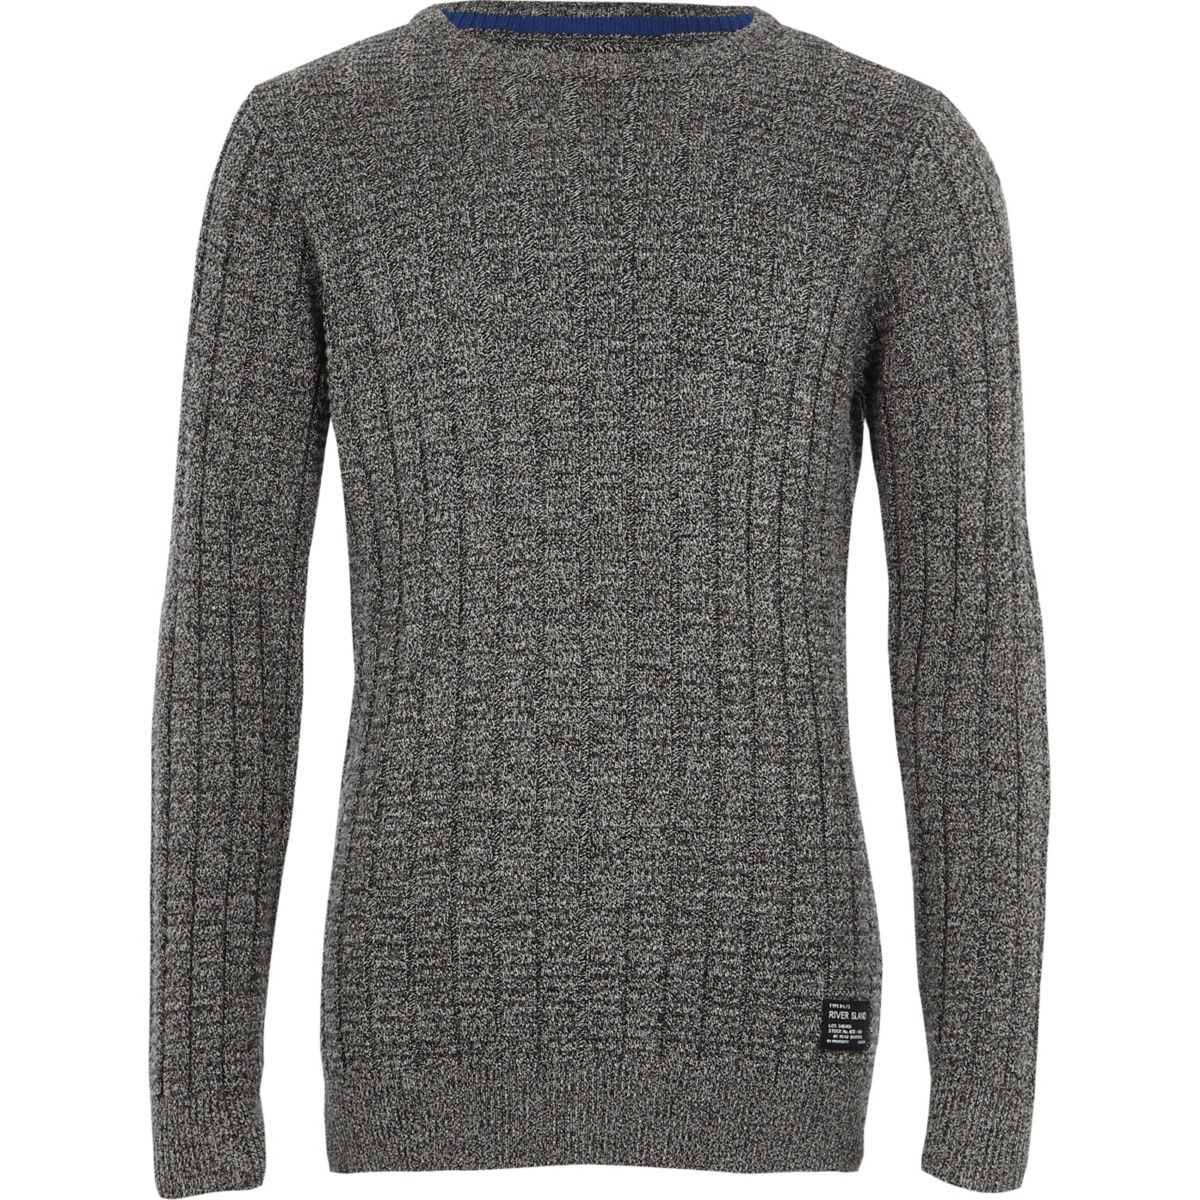 Boys grey textured knit jumper